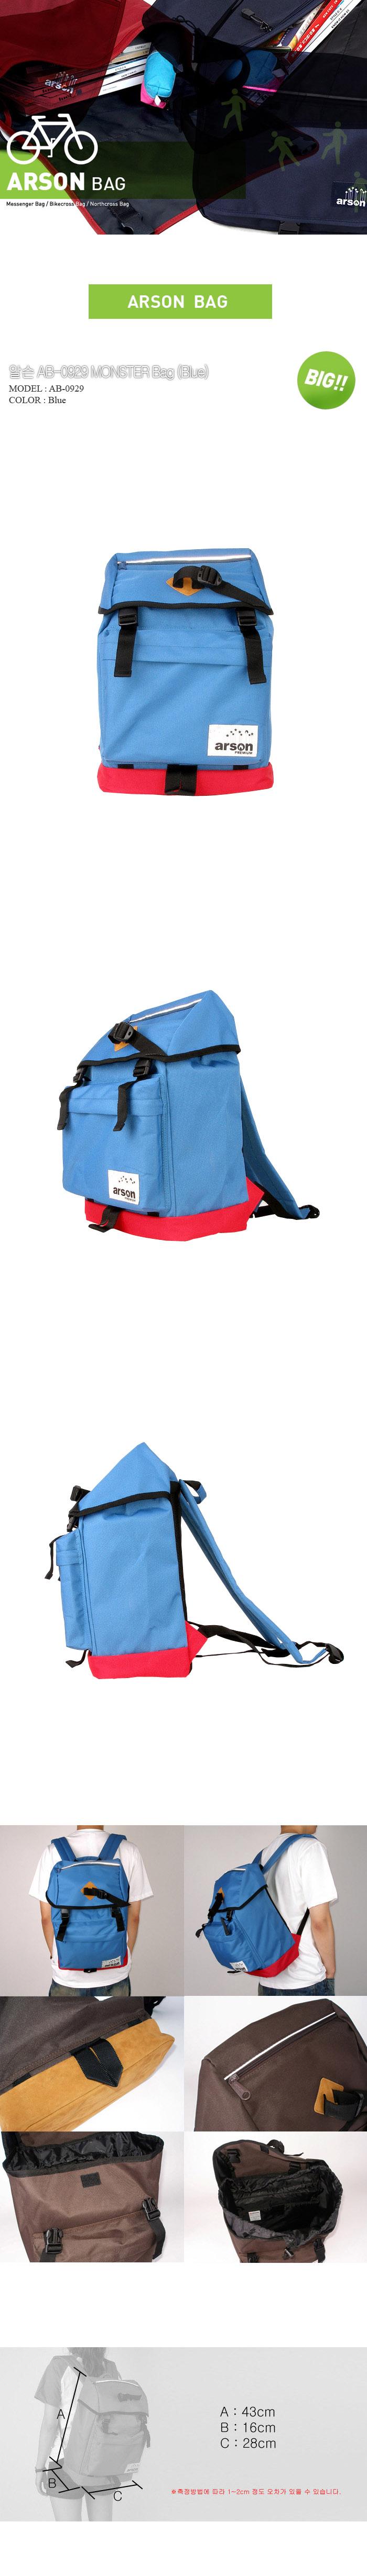 [ ARSON ] AB-0929 (Blue)/Backpack School Bag